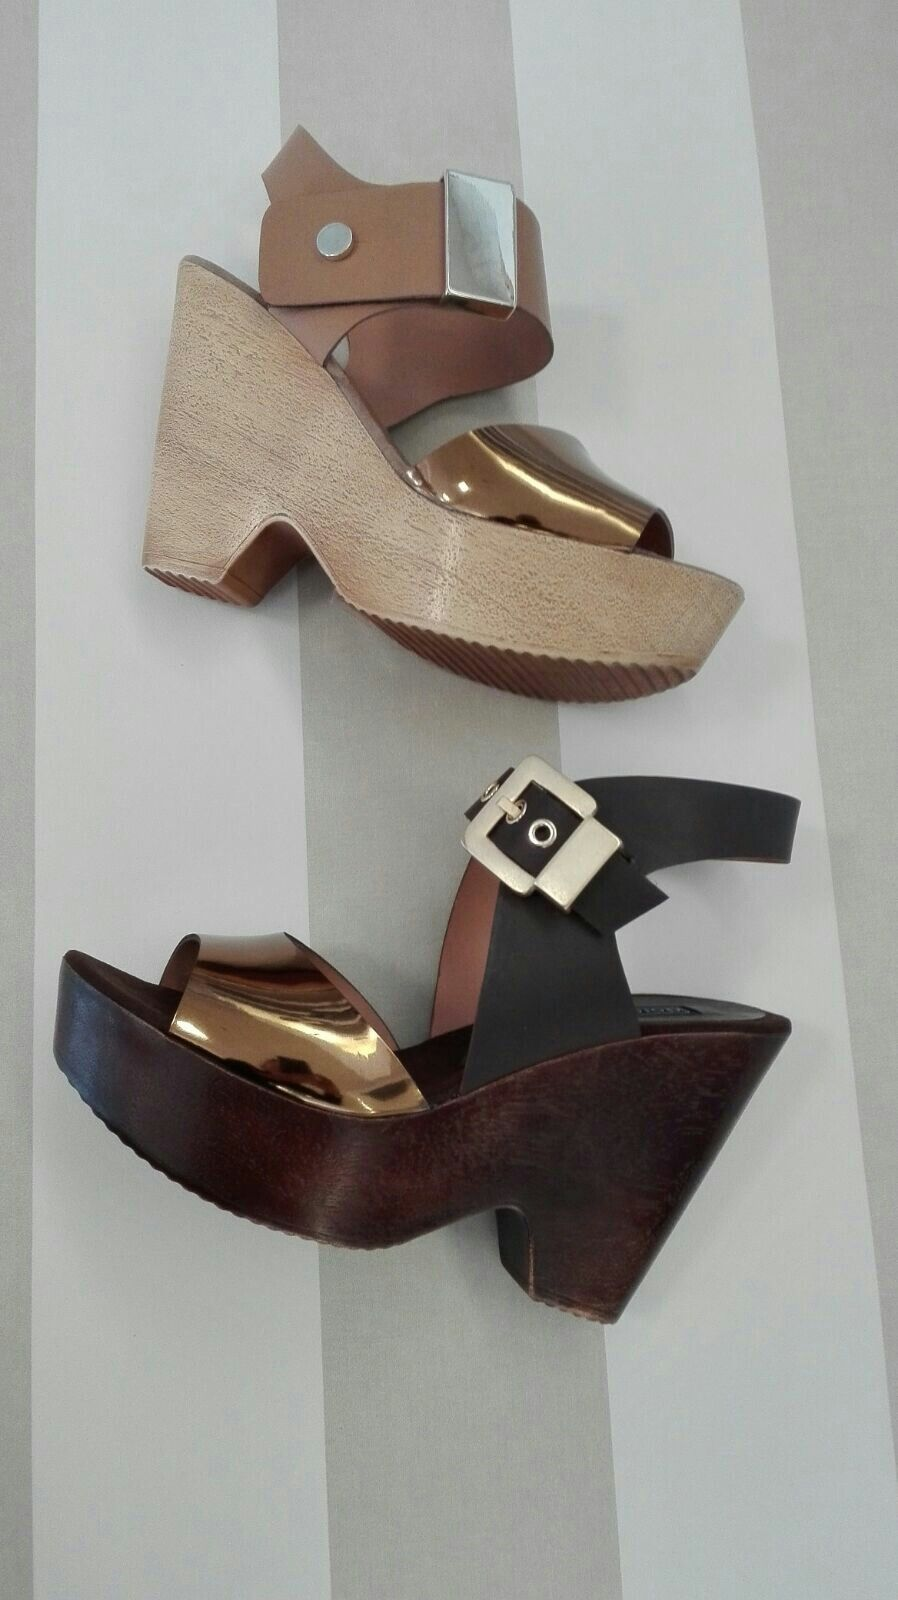 Platform De Paez Sandals Pin En Calzados EYDH2IW9